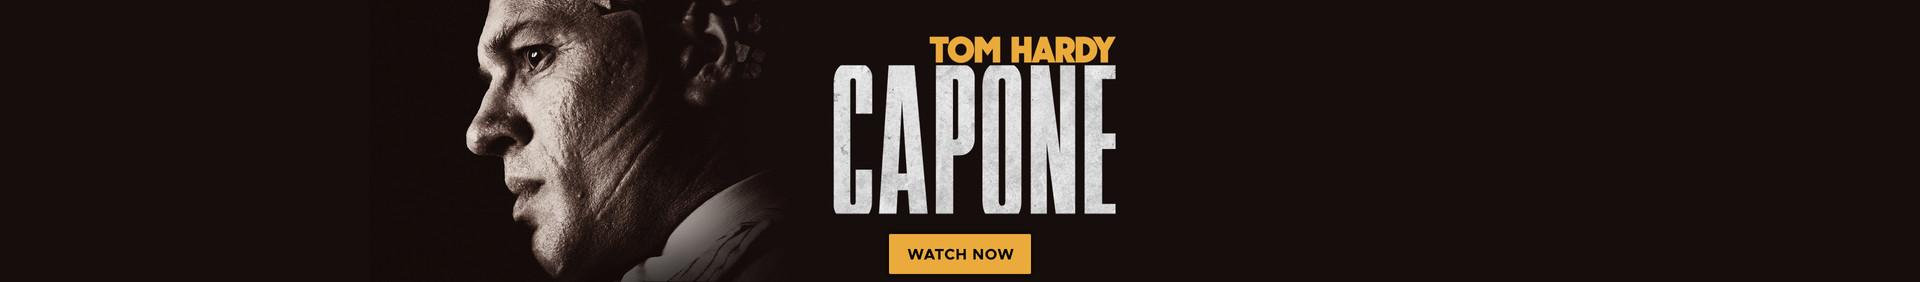 Capone-VPBanner.jpg